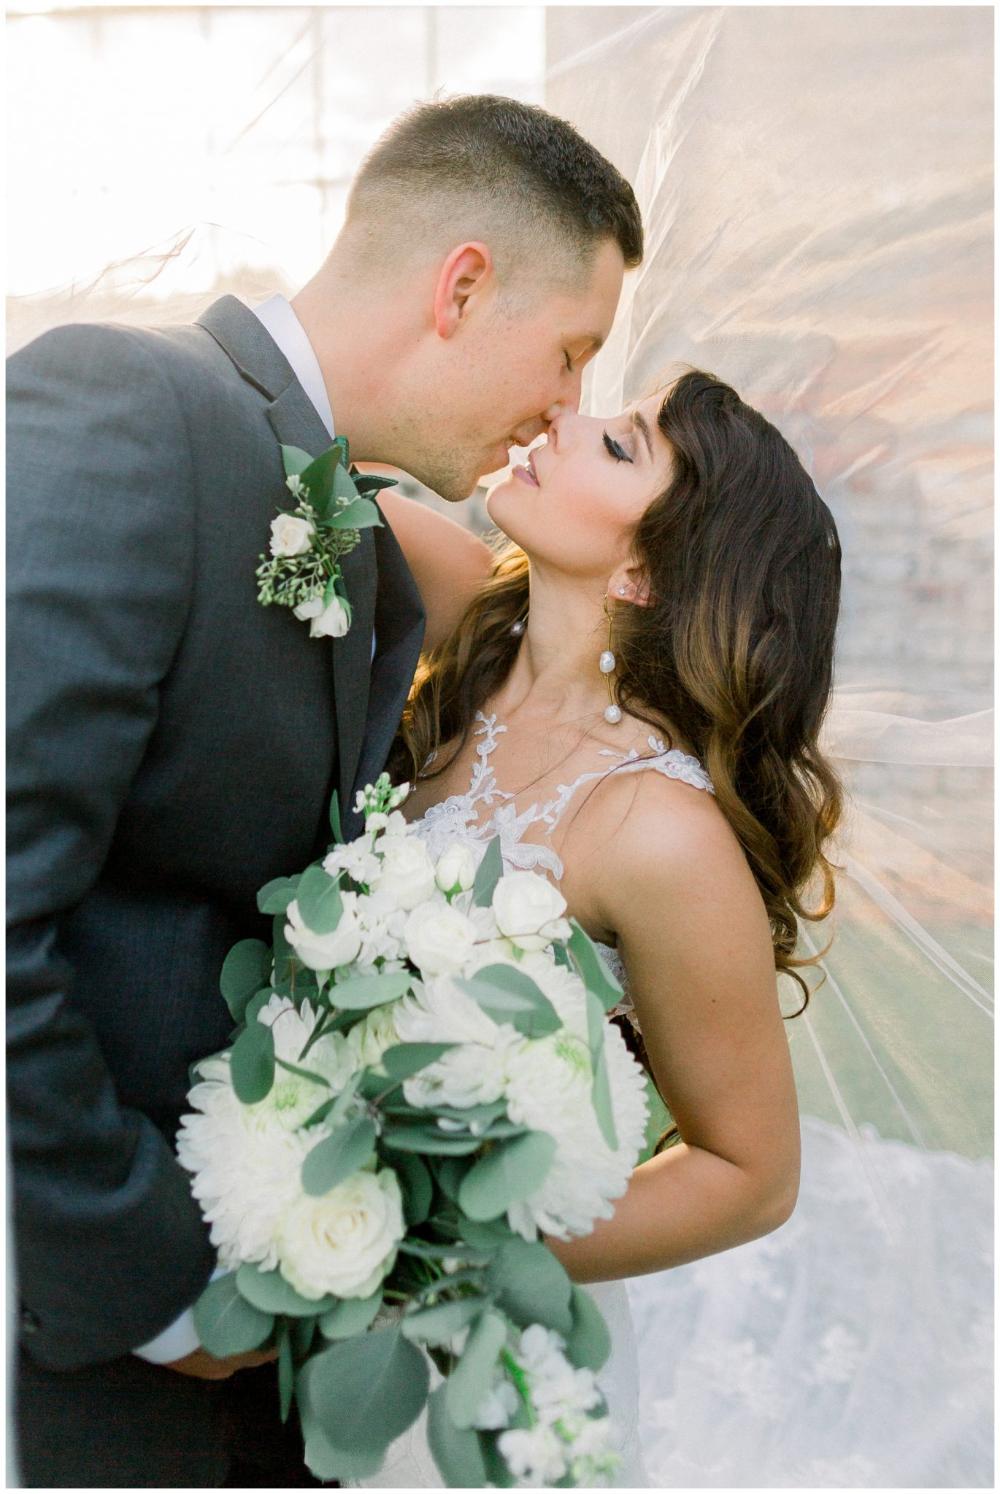 Bryttney Colin In 2020 Georgia Wedding Photographer Event Center Bridesmaids Photos